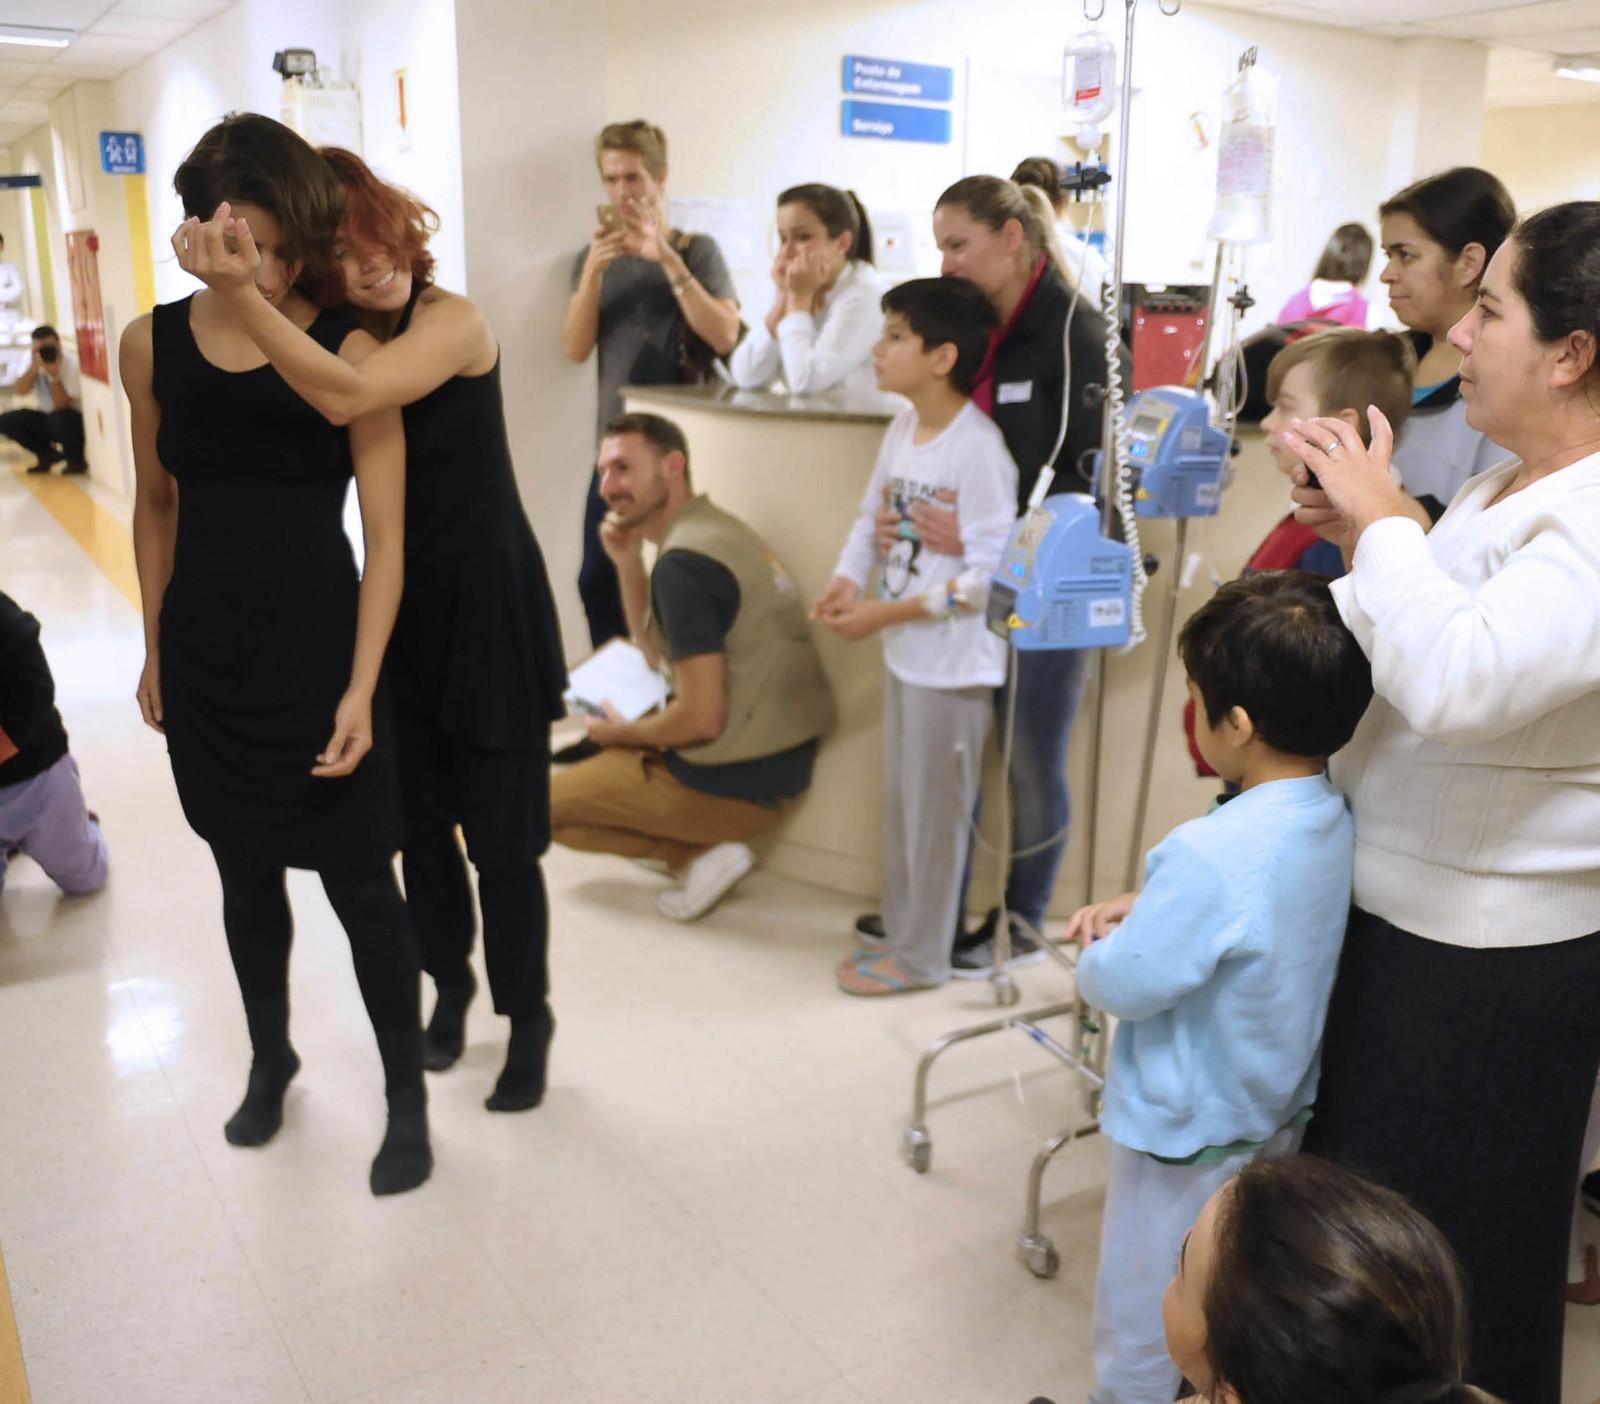 Visita ao Hospital Infantil Dr. Jeser Amarante 24.07.2017 - 35º Festival de Dança de Joinville